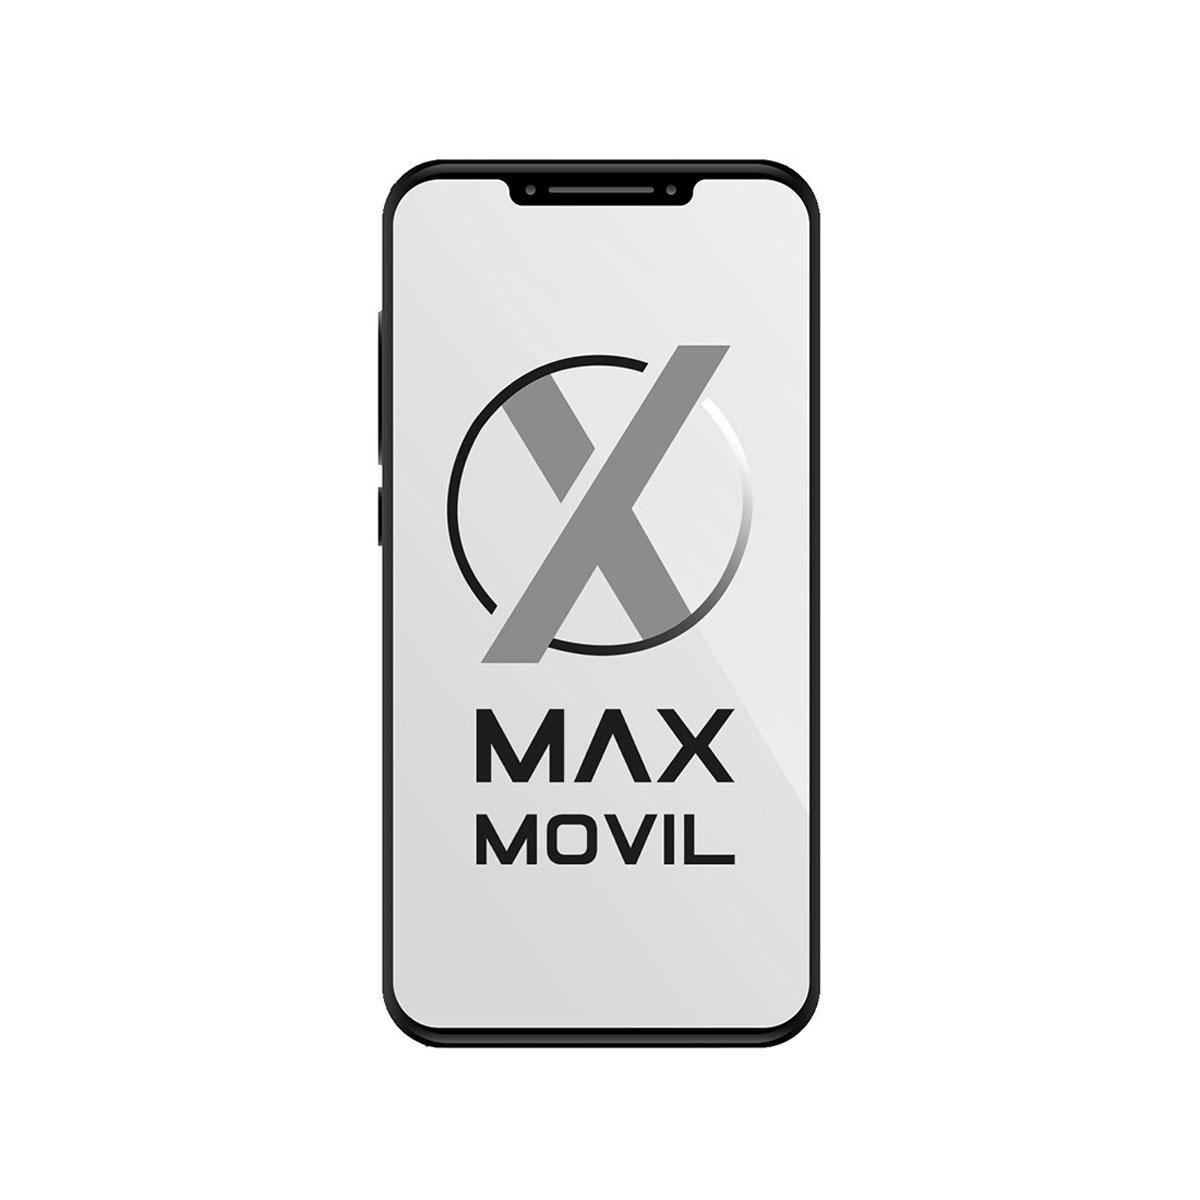 Memoria Mooster  USB TOONS 8GB skull red eyes mx 1303